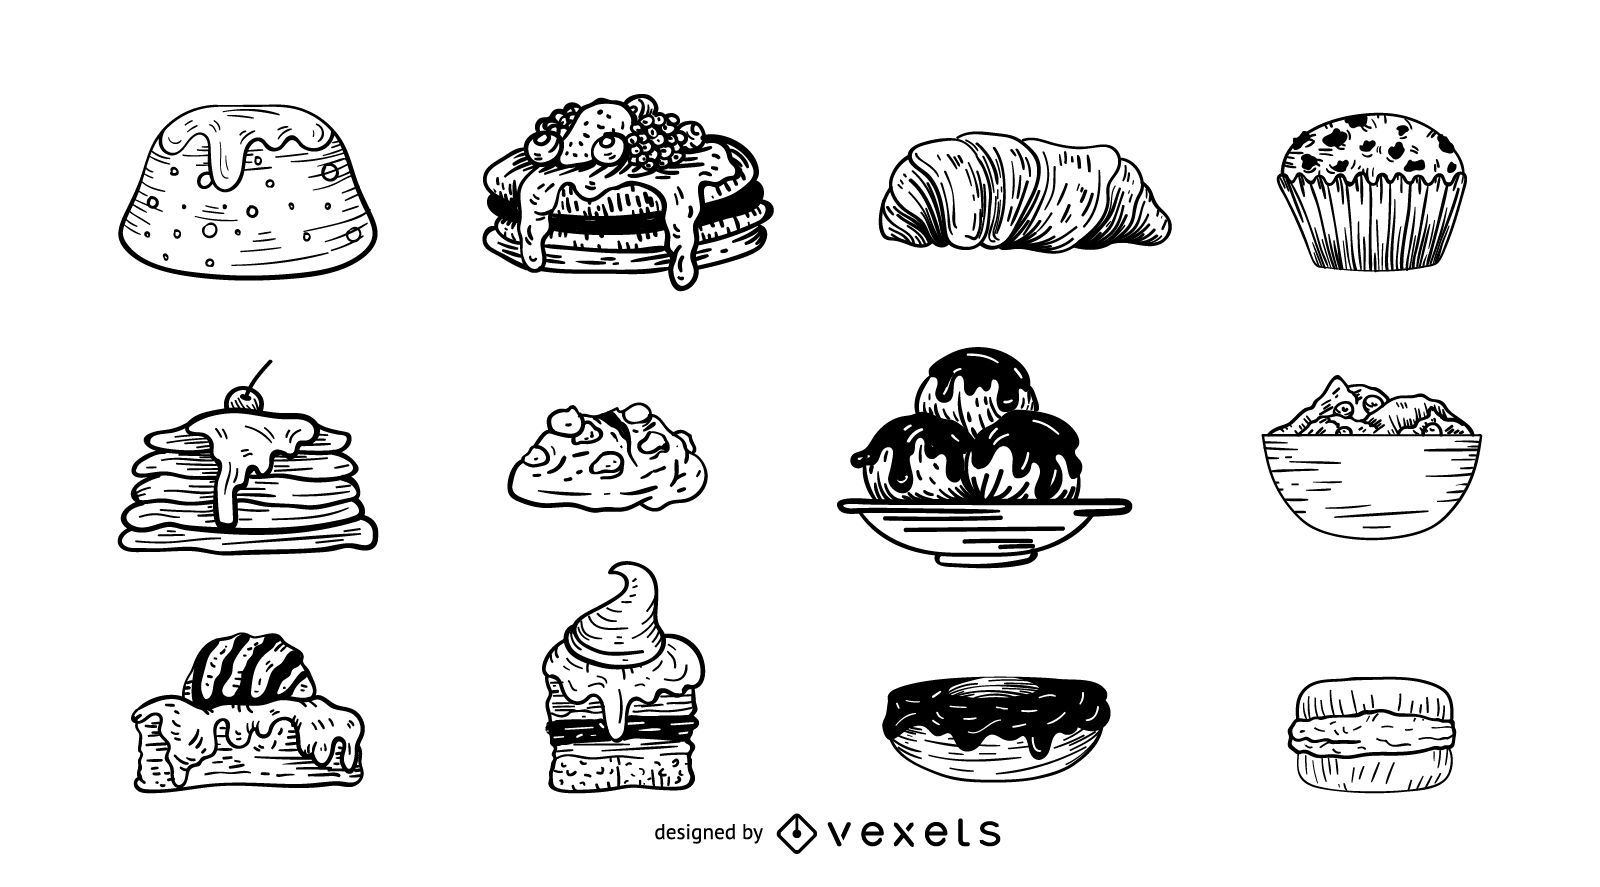 Desserts and pastries illustration set